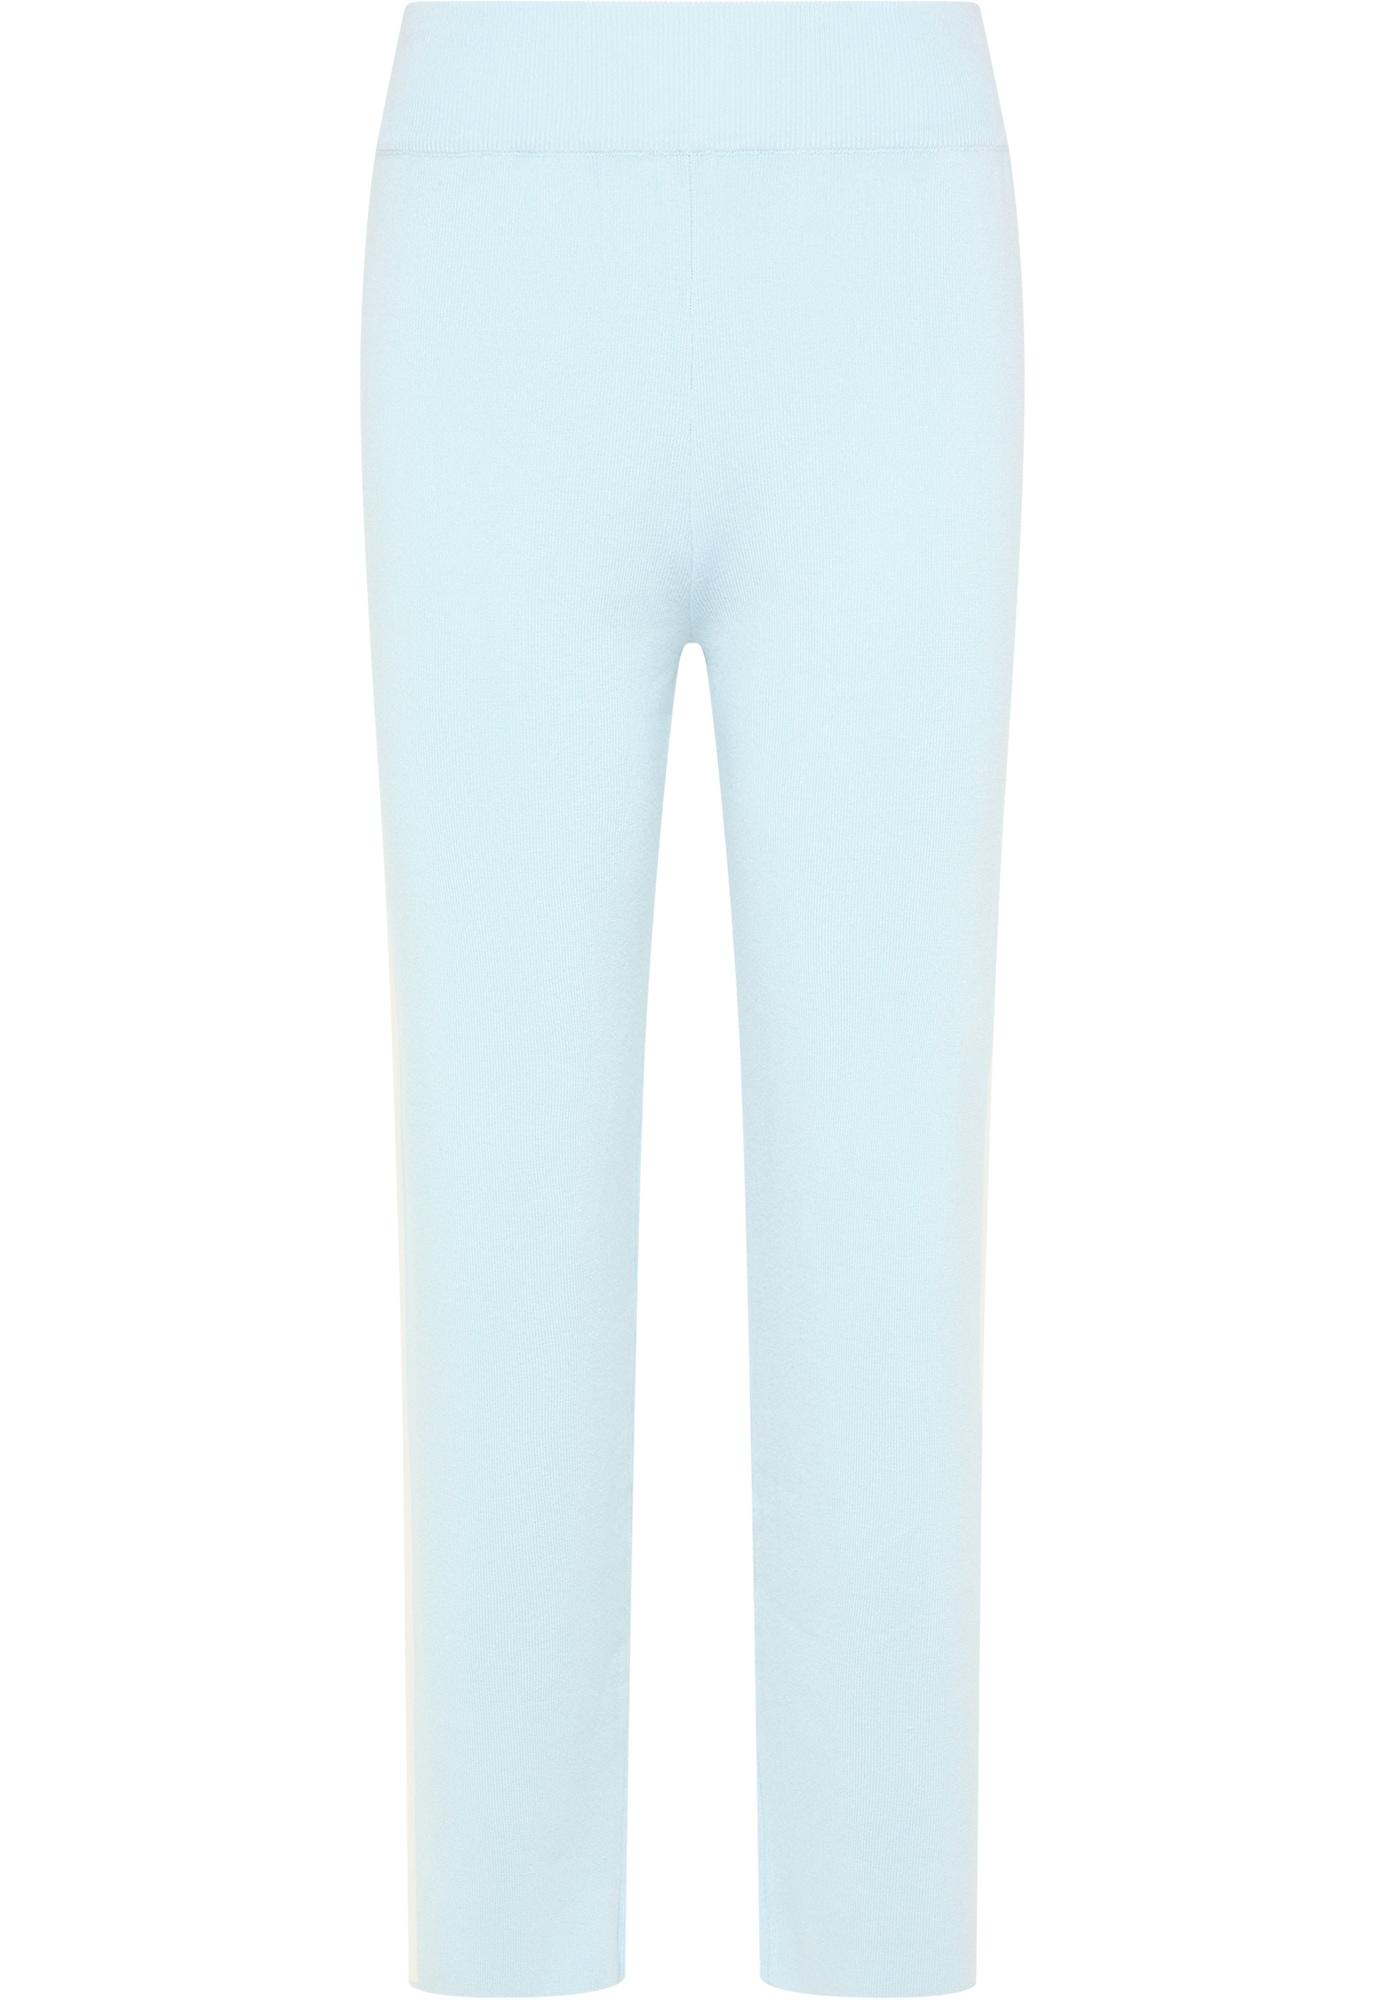 usha BLUE LABEL Kelnės šviesiai mėlyna / balta